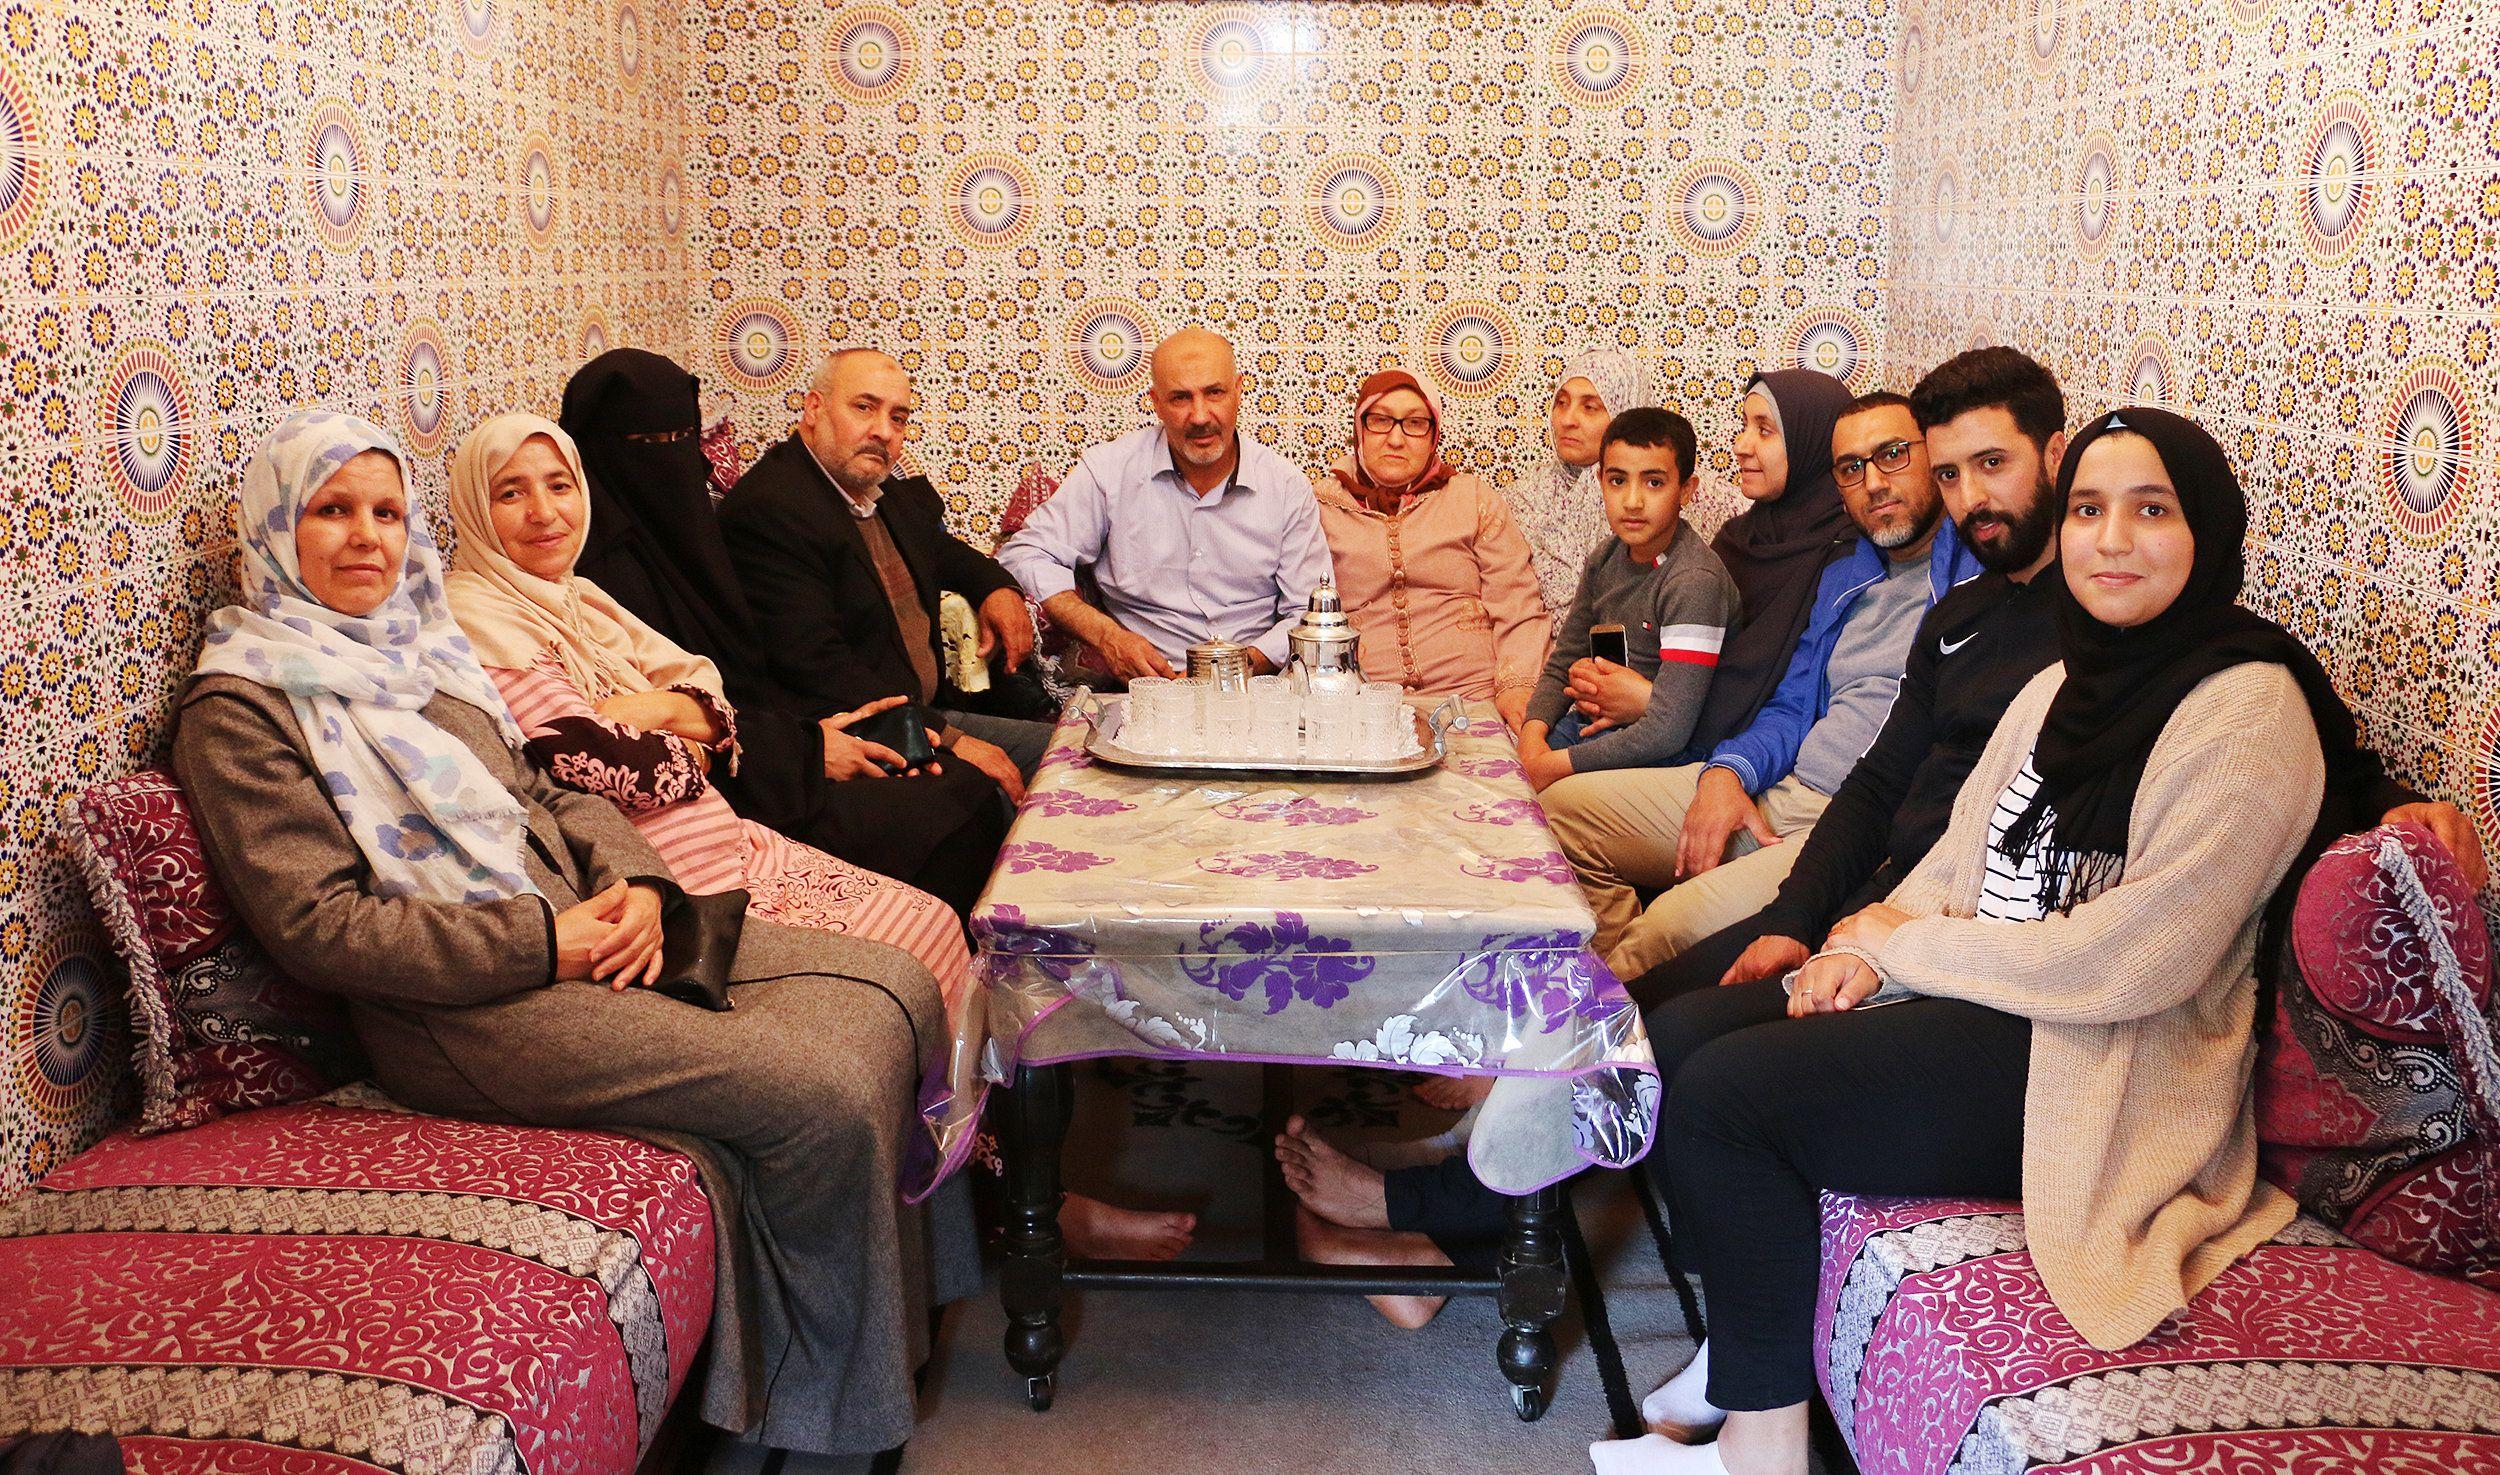 Nasser's family in 2018 in the home where he grew up in Casablanca, Morocco.